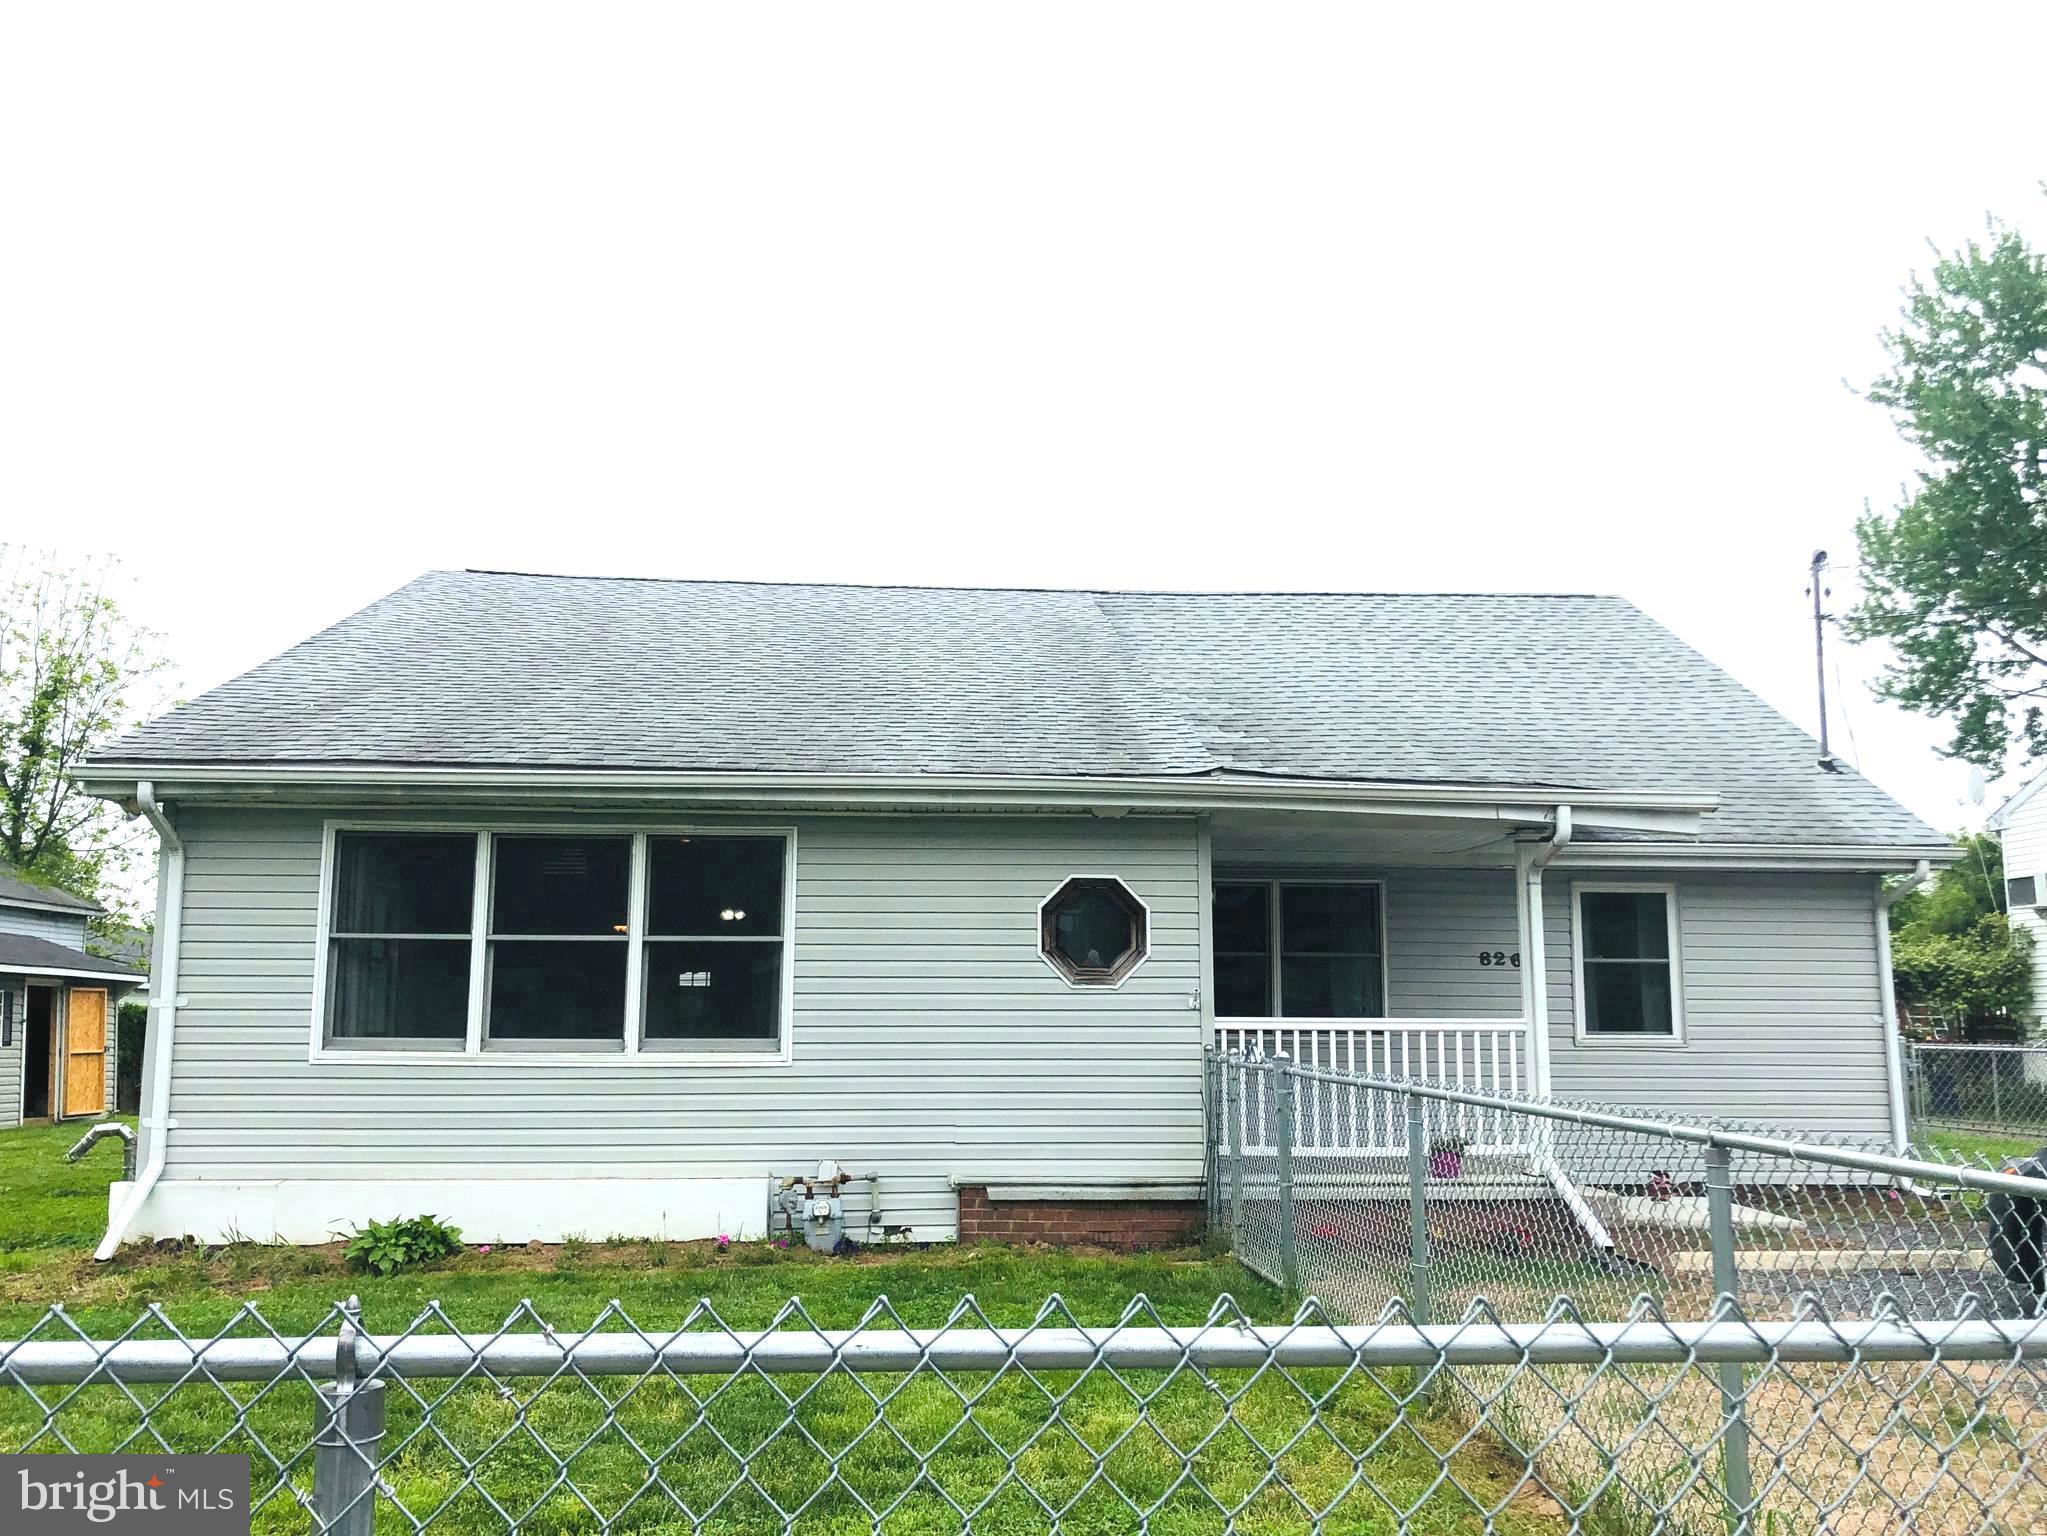 826 2ND AVENUE, CROYDON, PA 19021